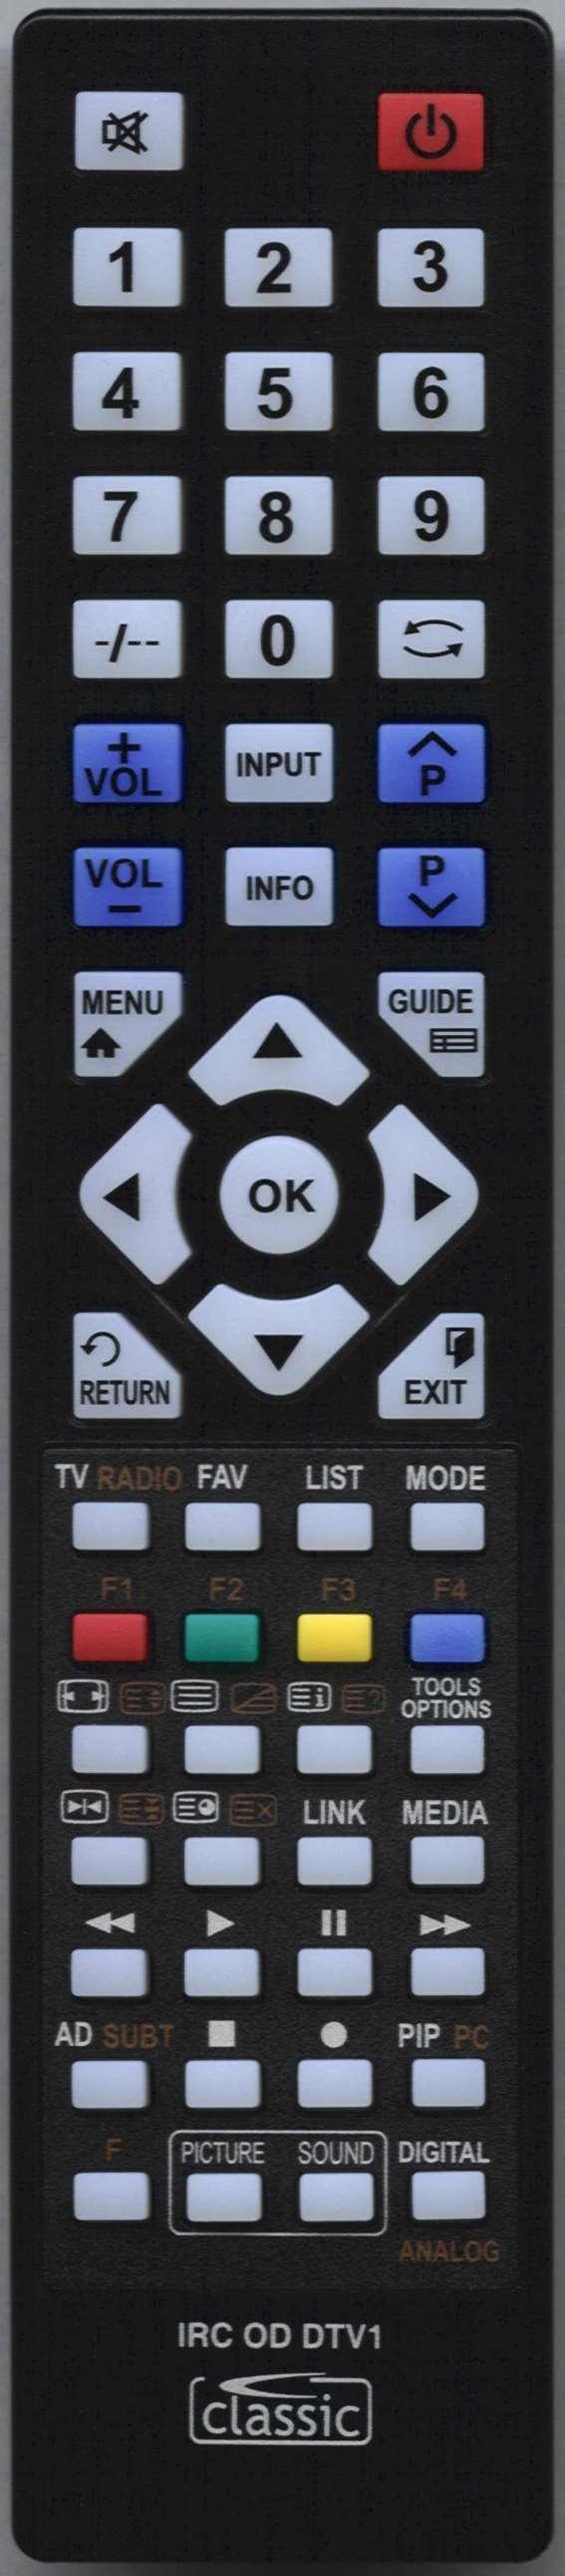 SAMSUNG LE37R88BD Remote Control Alternative